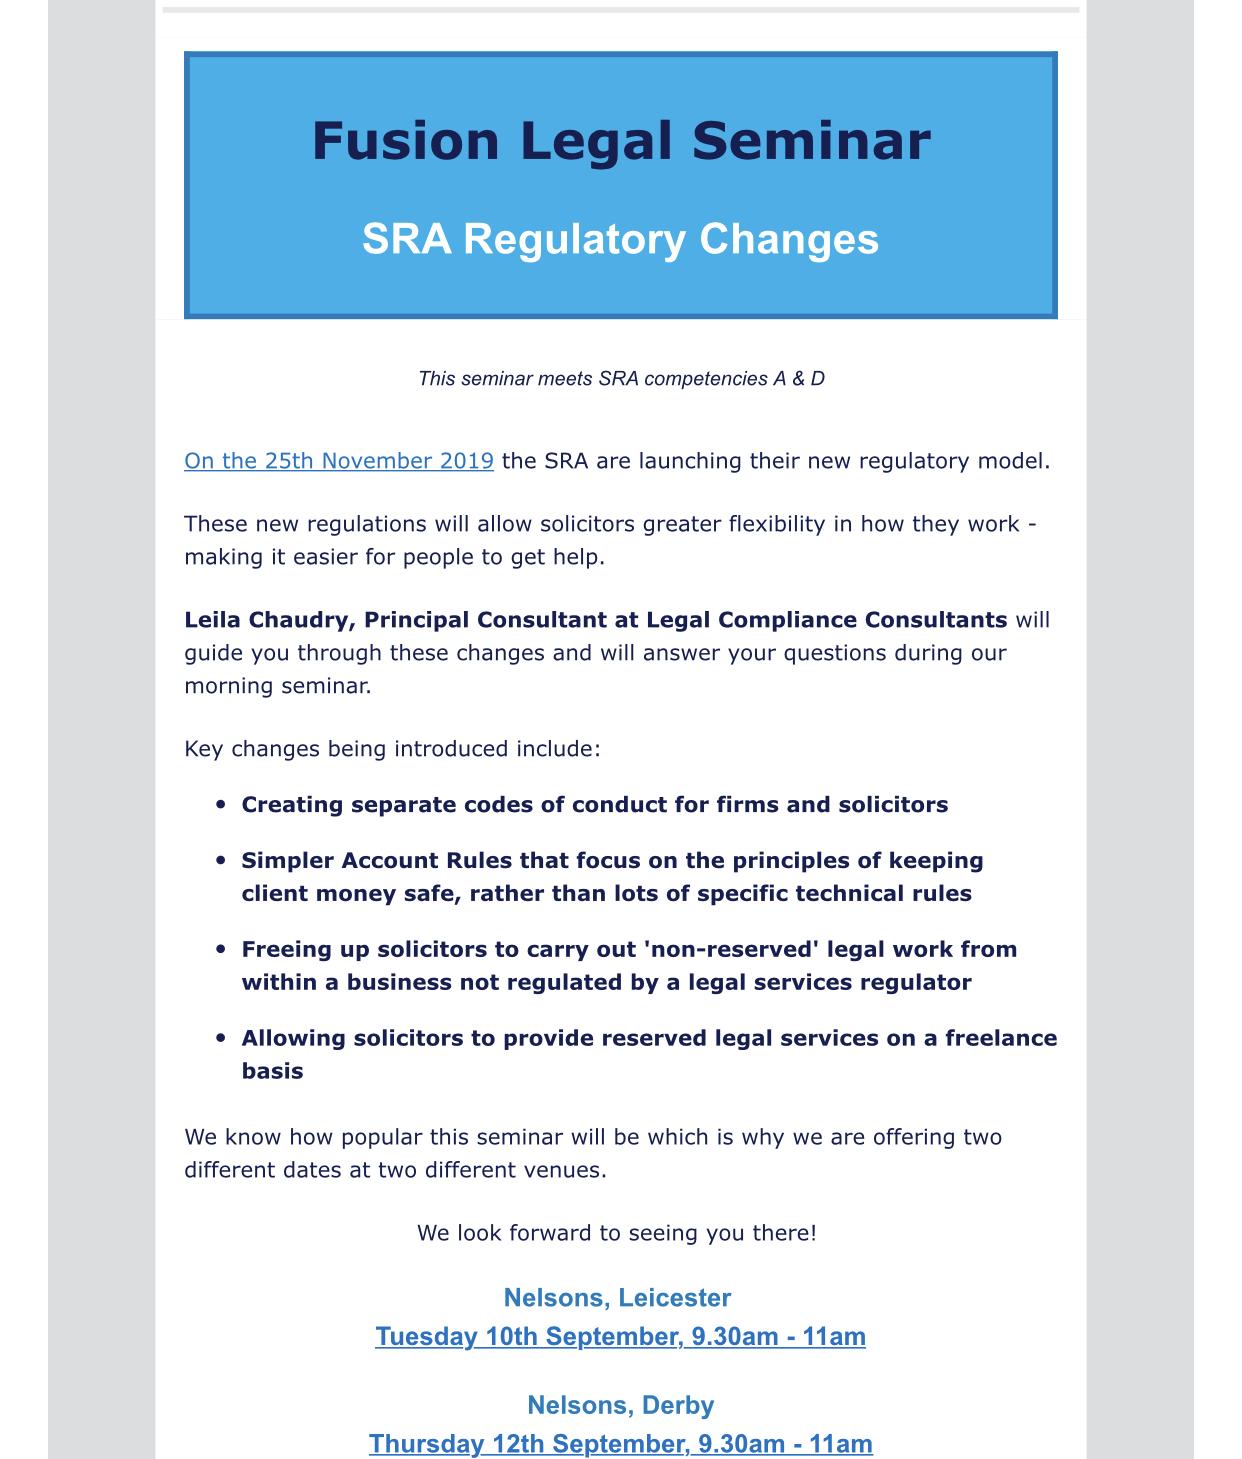 Fusion Legal Seminar -September 2019